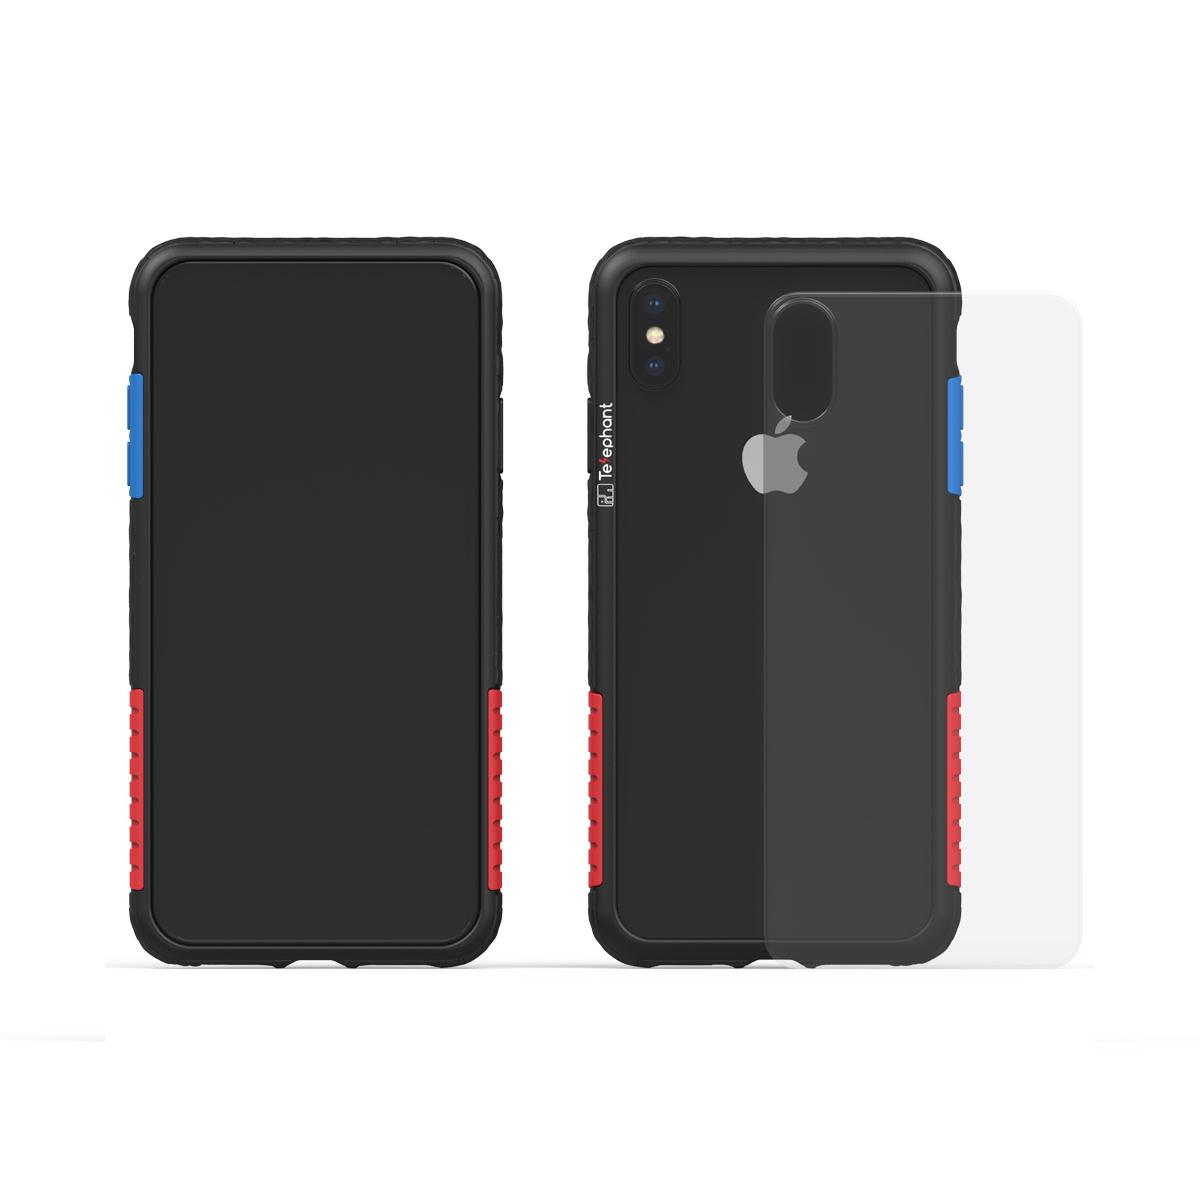 NMD-iPhonePlus-OG黑-e1530699892987.jpg